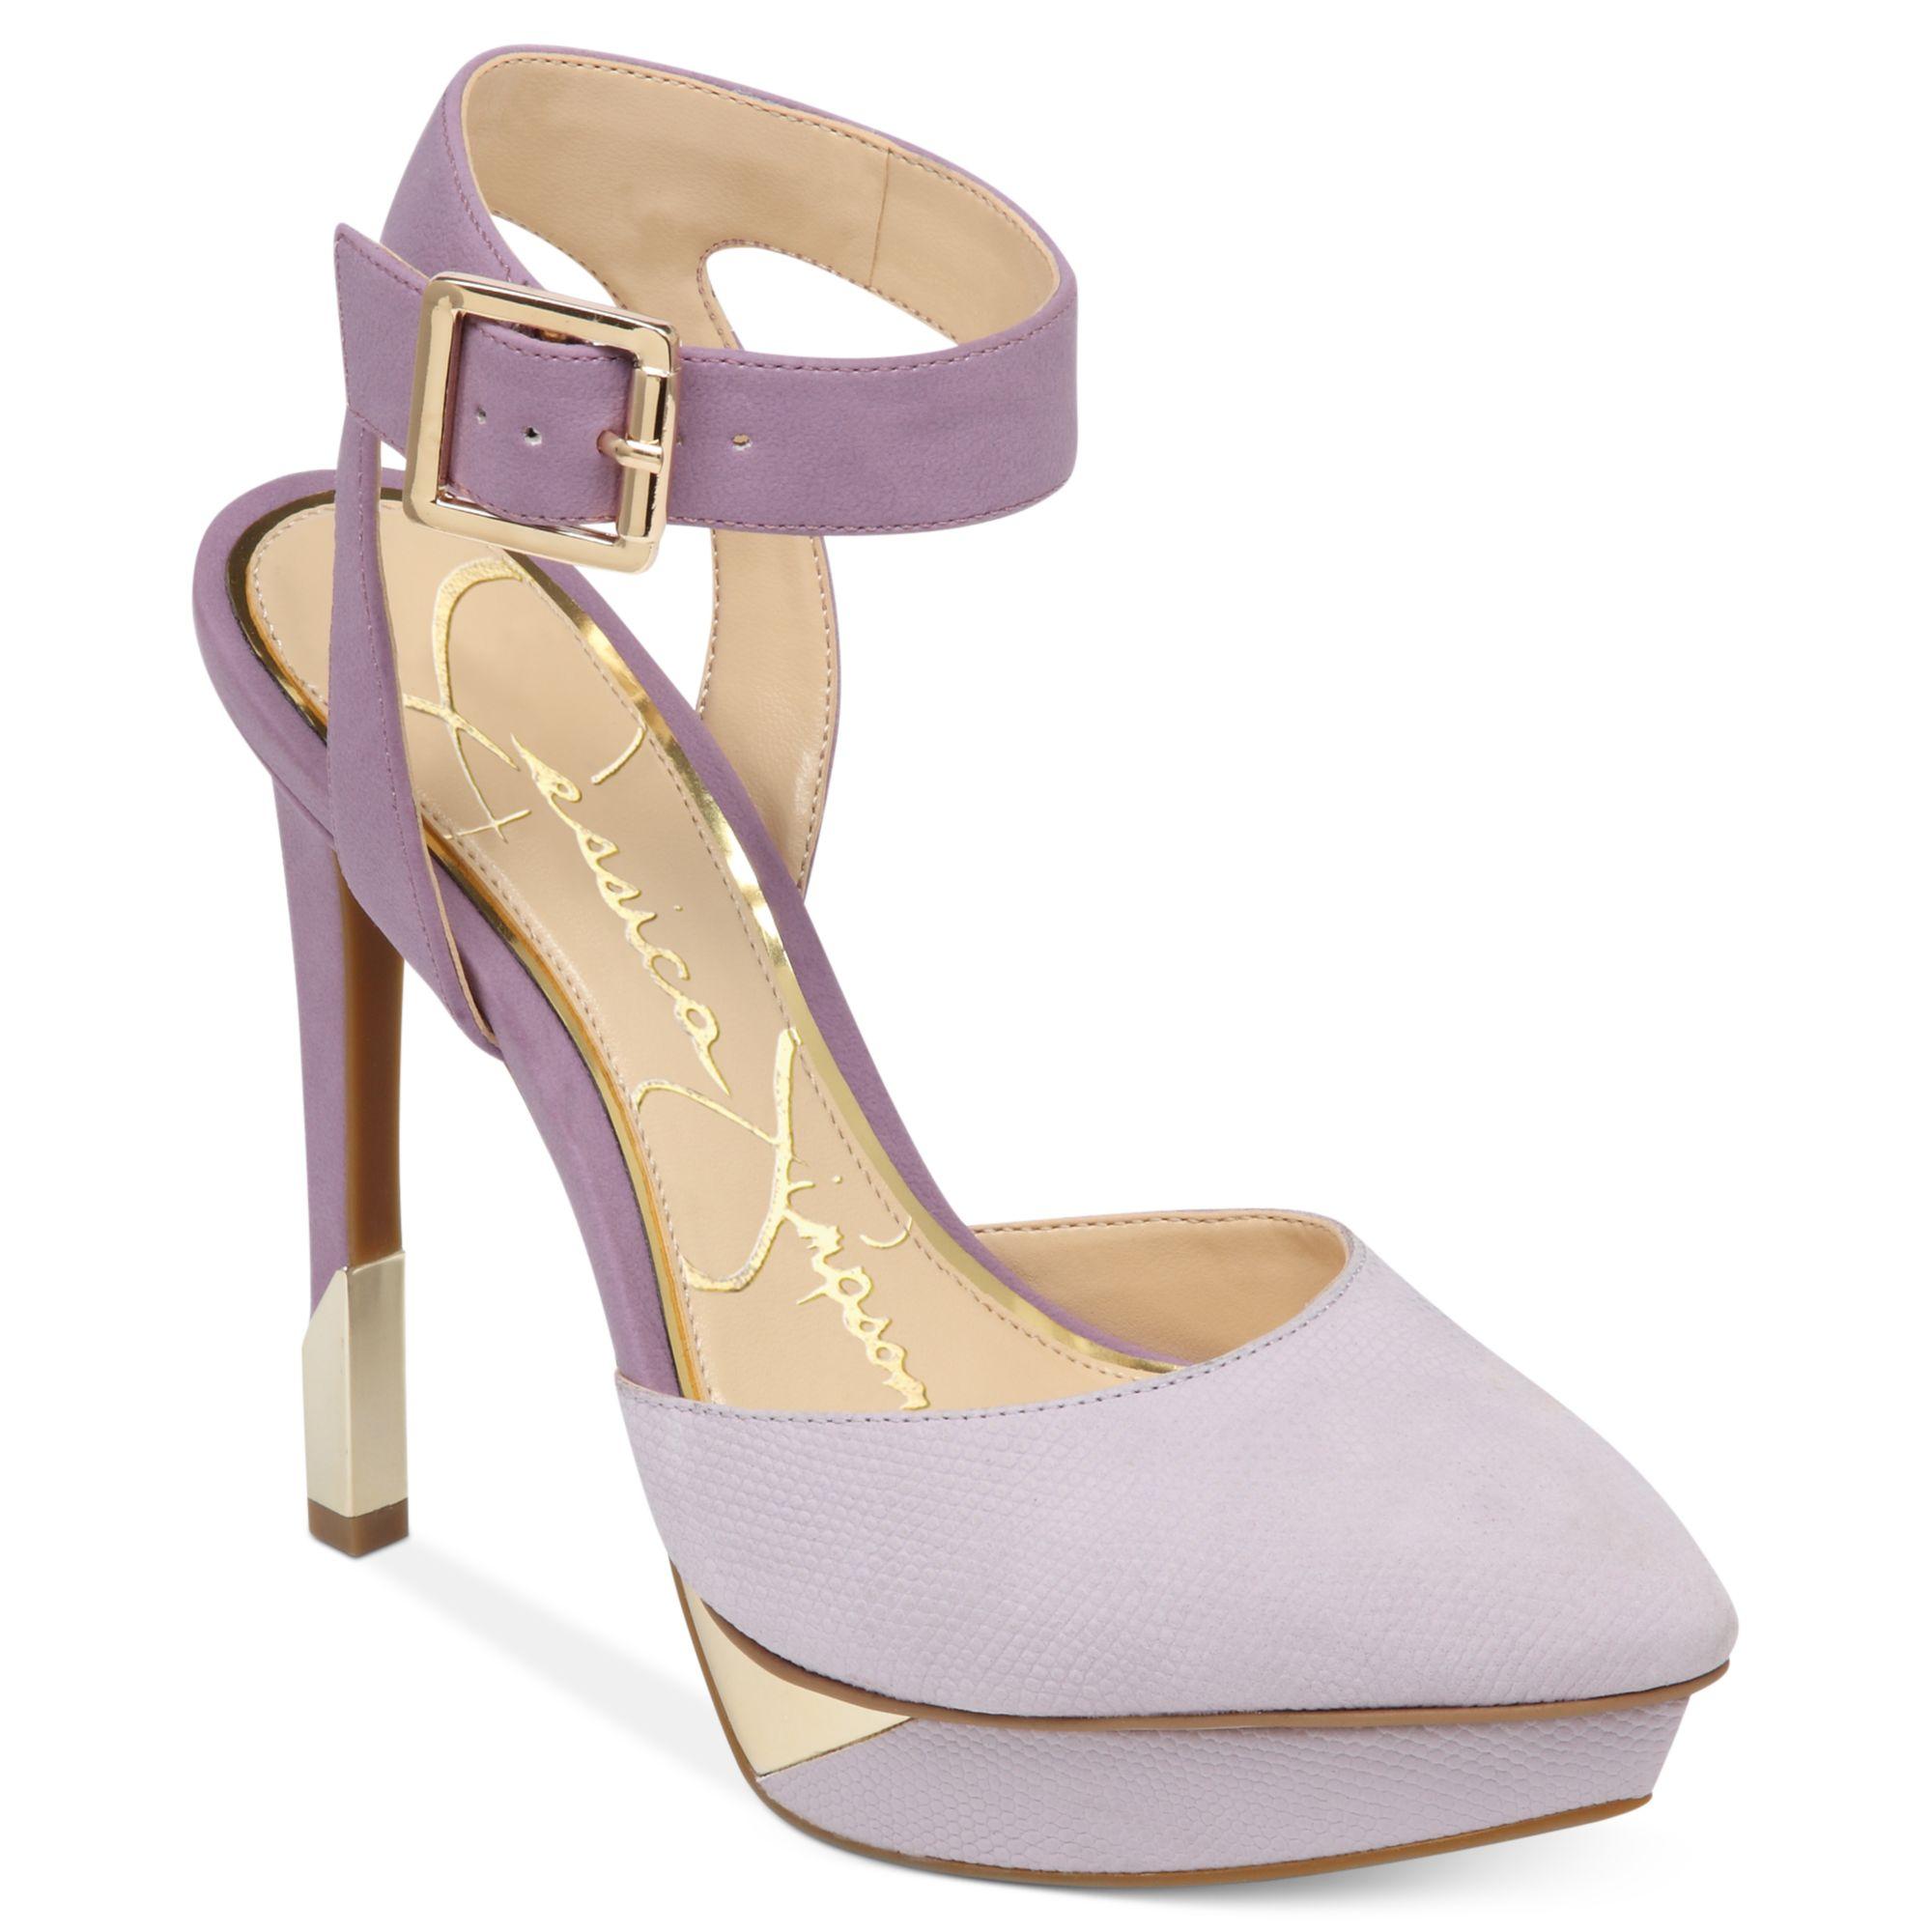 Jessica simpson Valleyy Ankle Strap Platform Pumps in Purple | Lyst